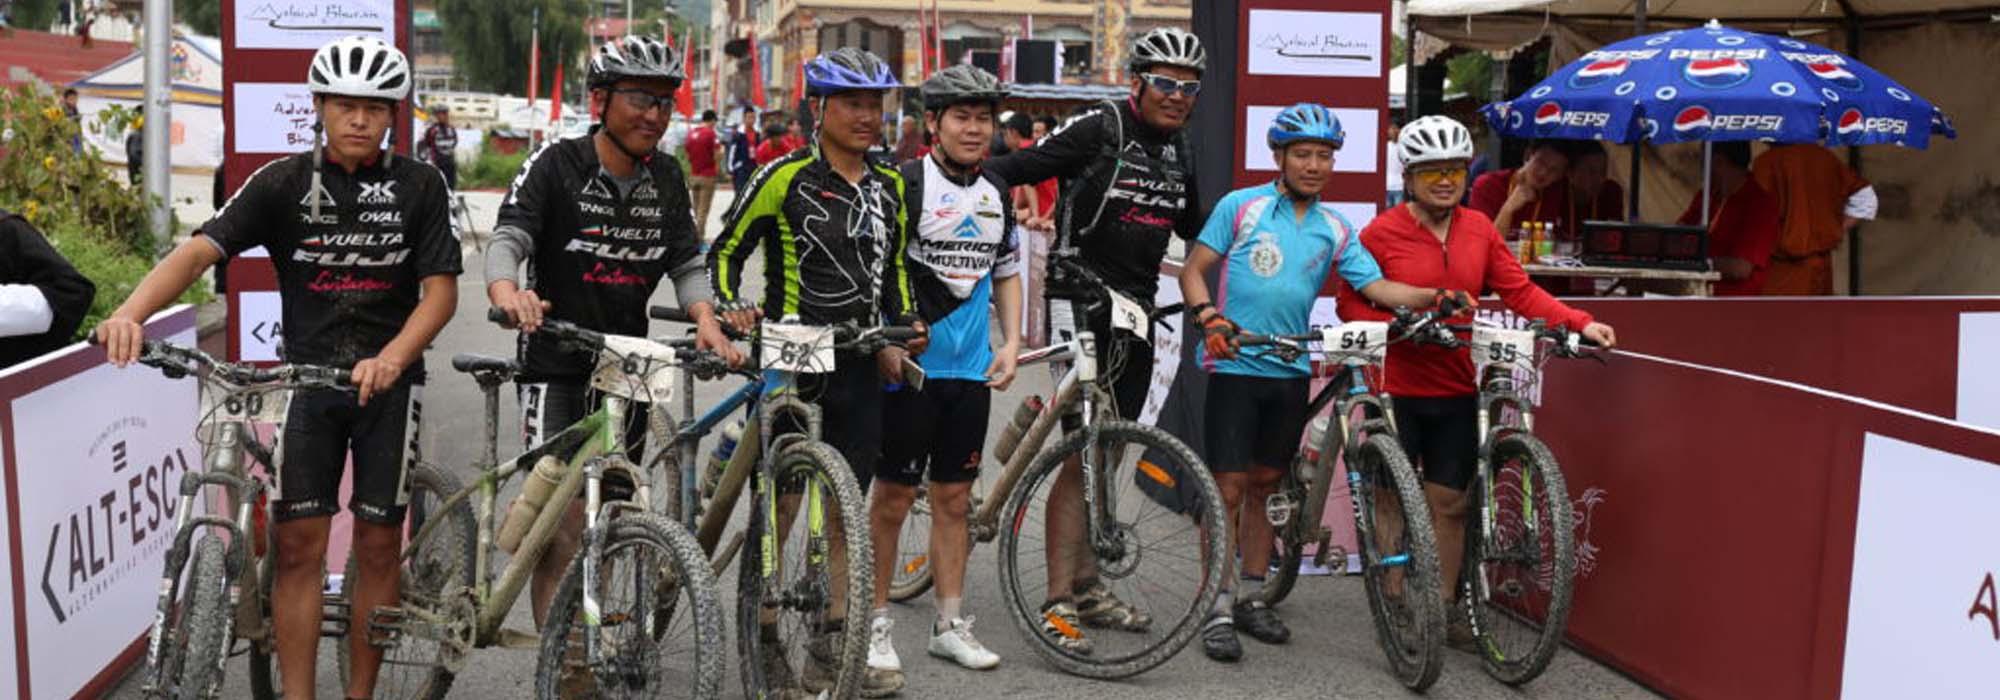 Tour of The Dragon 268 kms